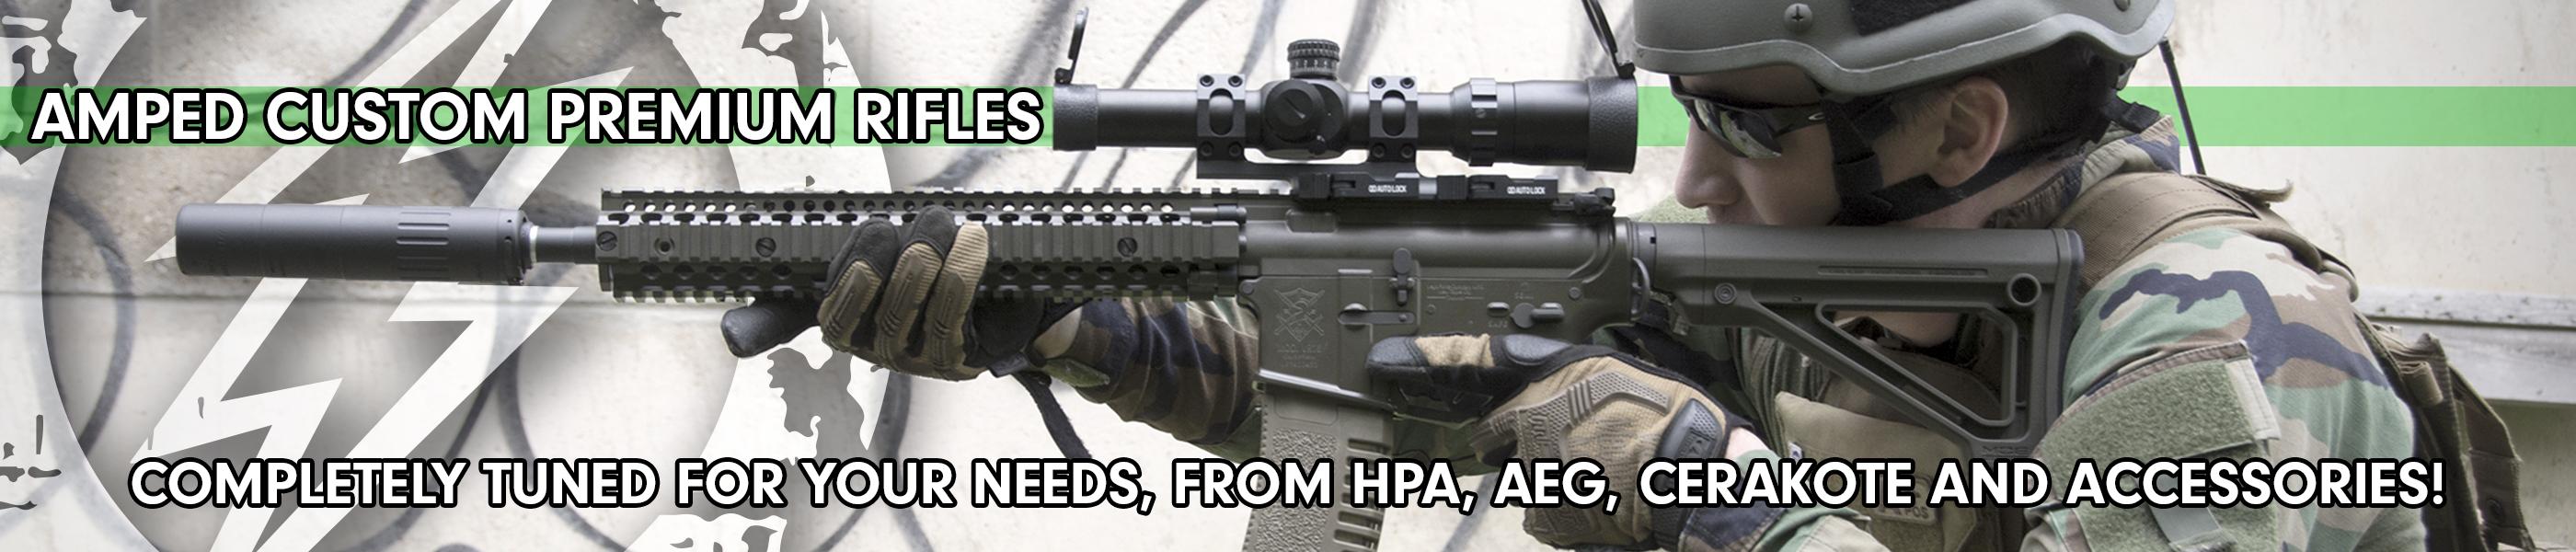 Custom Cerakote Rifles!